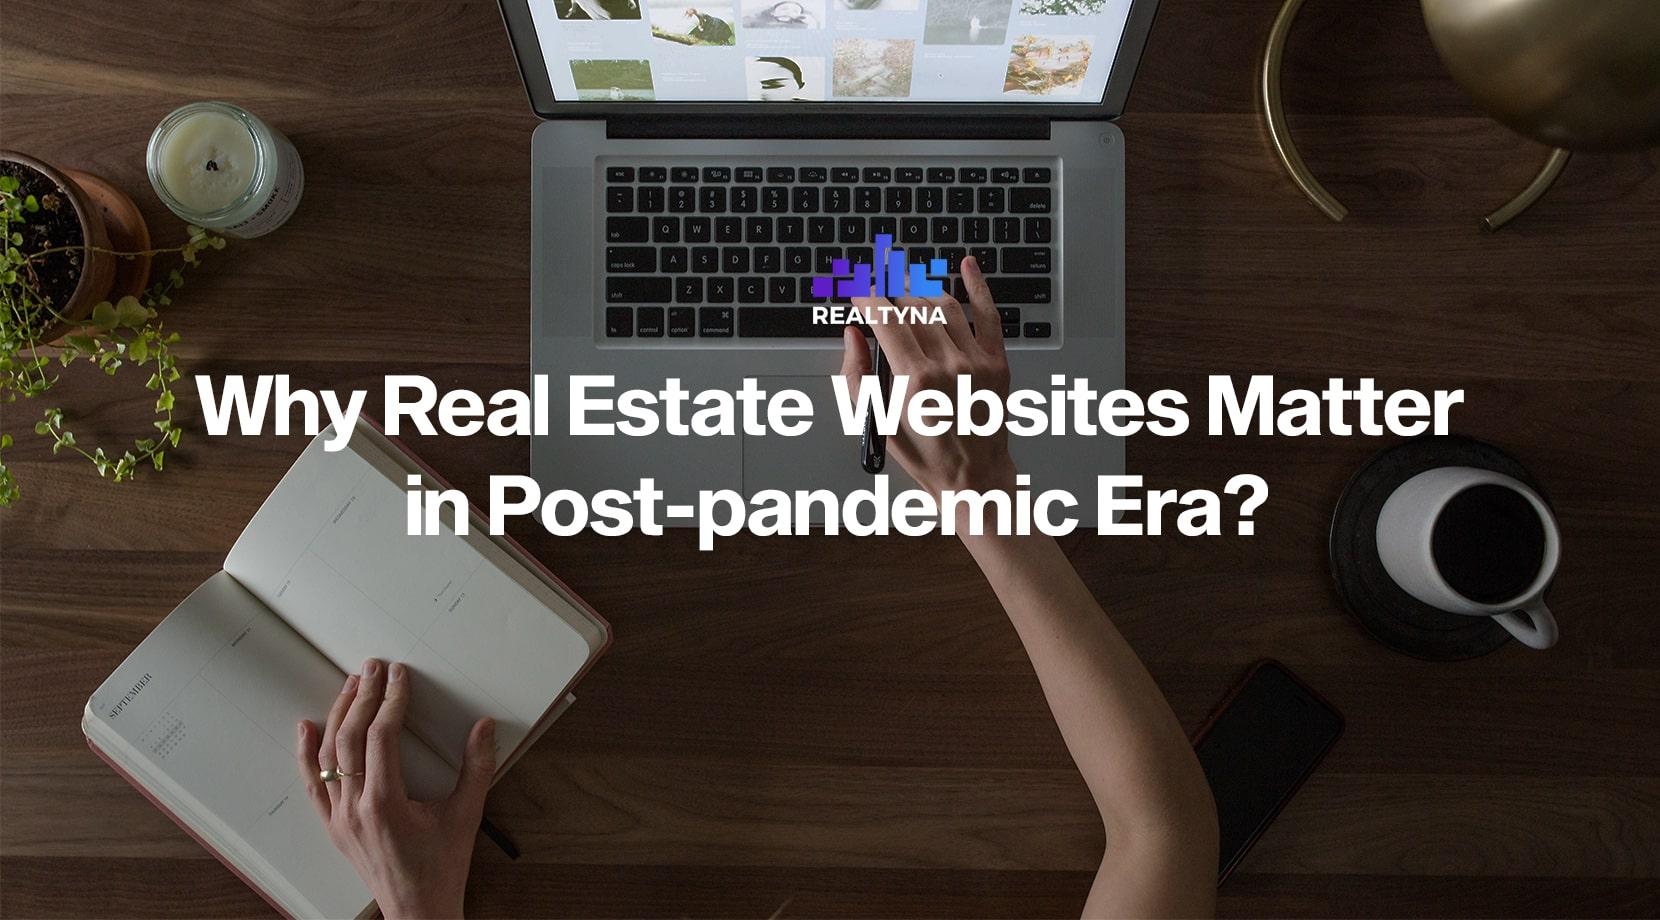 Why Real Estate Websites Matter in Post-pandemic Era